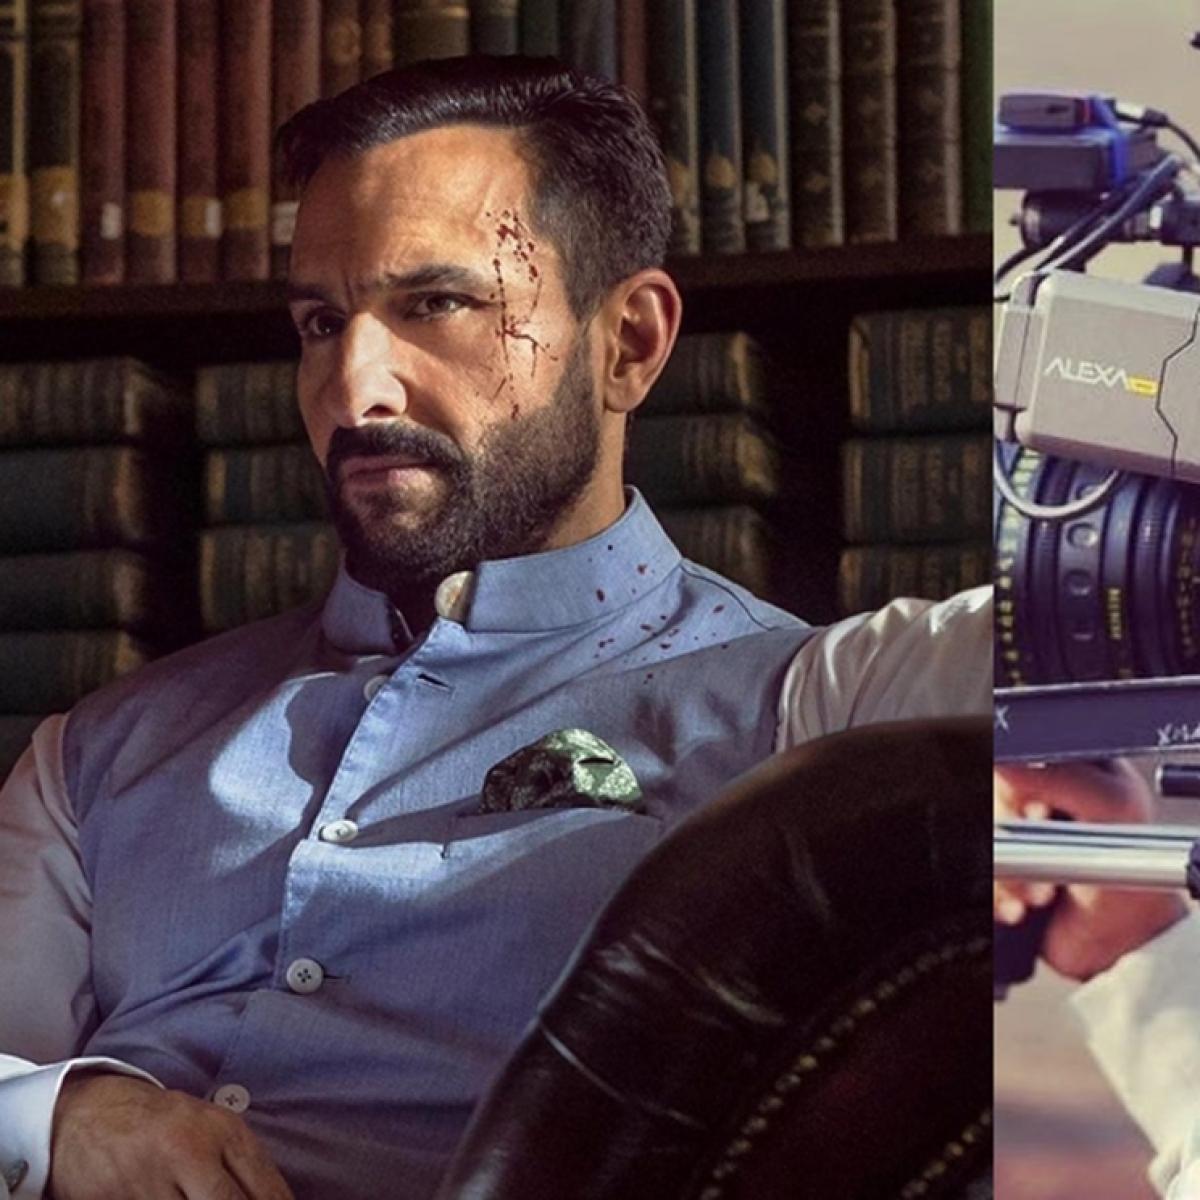 'You can't talk to me…': When Saif Ali Khan got uncomfortable with Ali Abbas Zafar's 'Salman-style' direction on 'Tandav' set